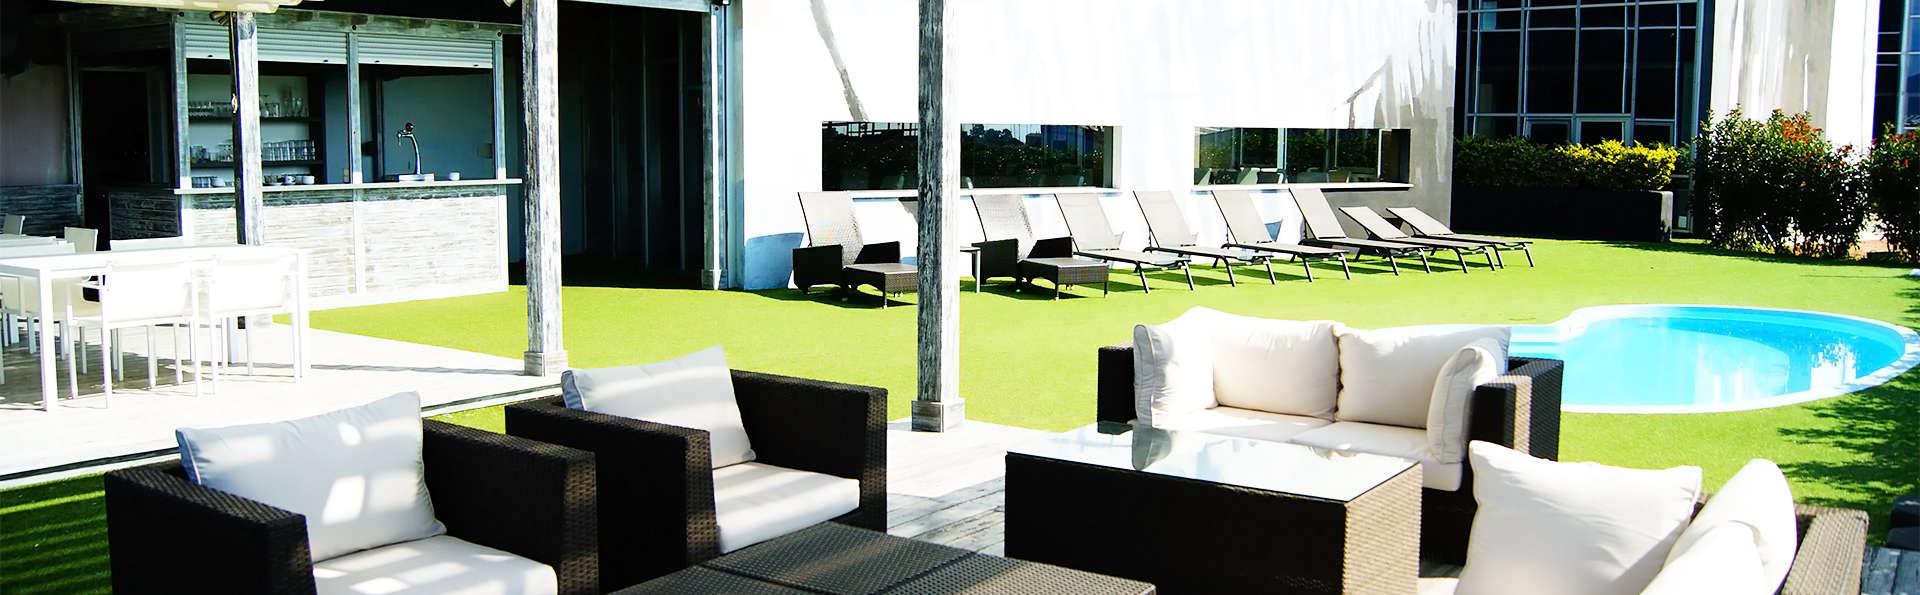 Hotel Sercotel Plana Parc - EDIT_pool2.jpg